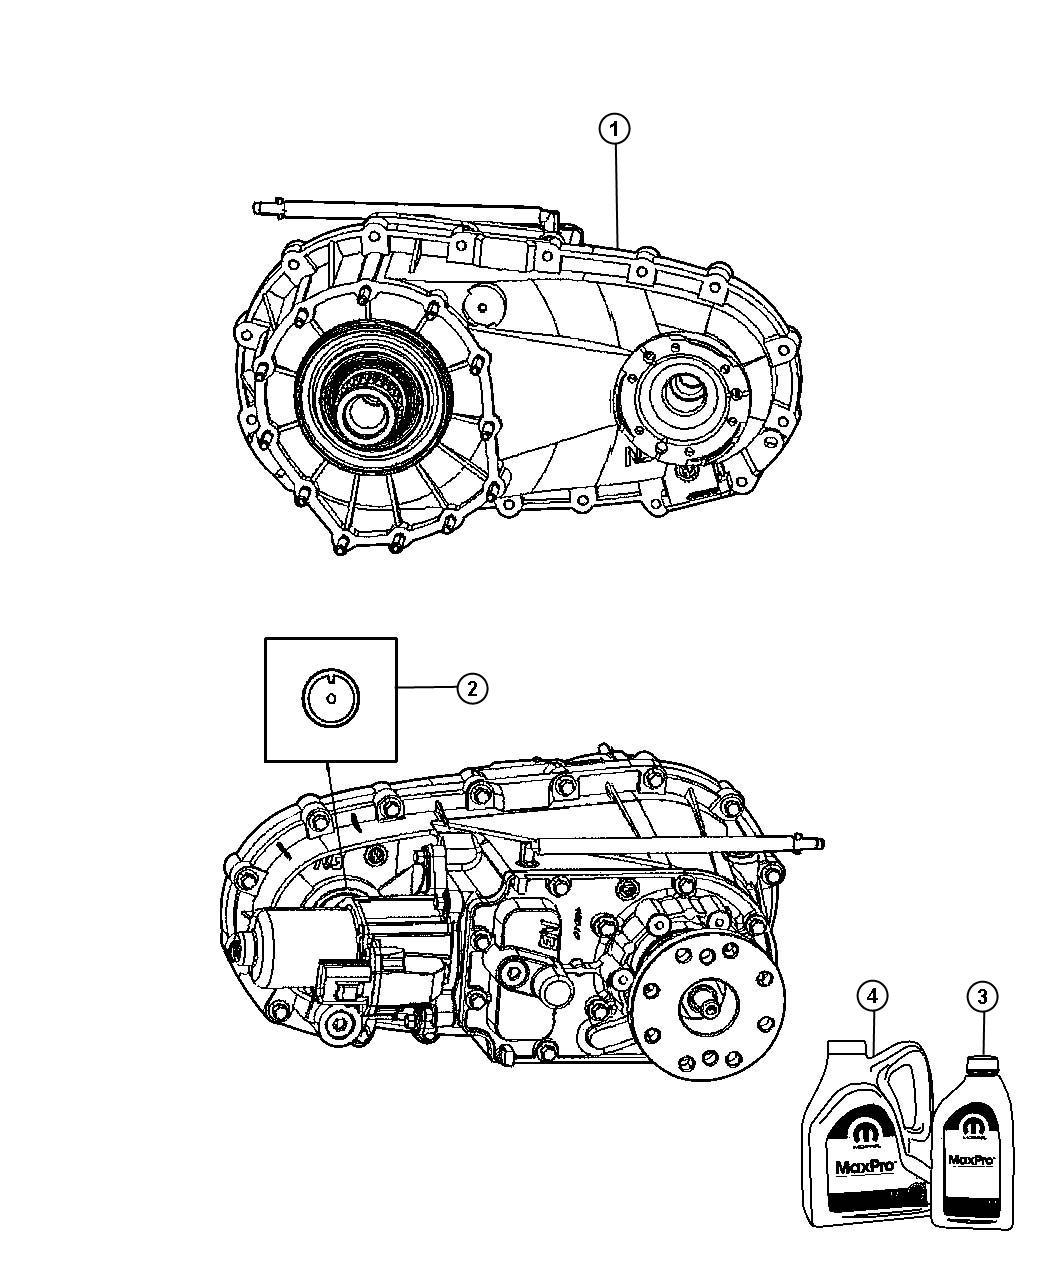 Jeep Liberty Fluid. Automatic transmission atf+4. Quart